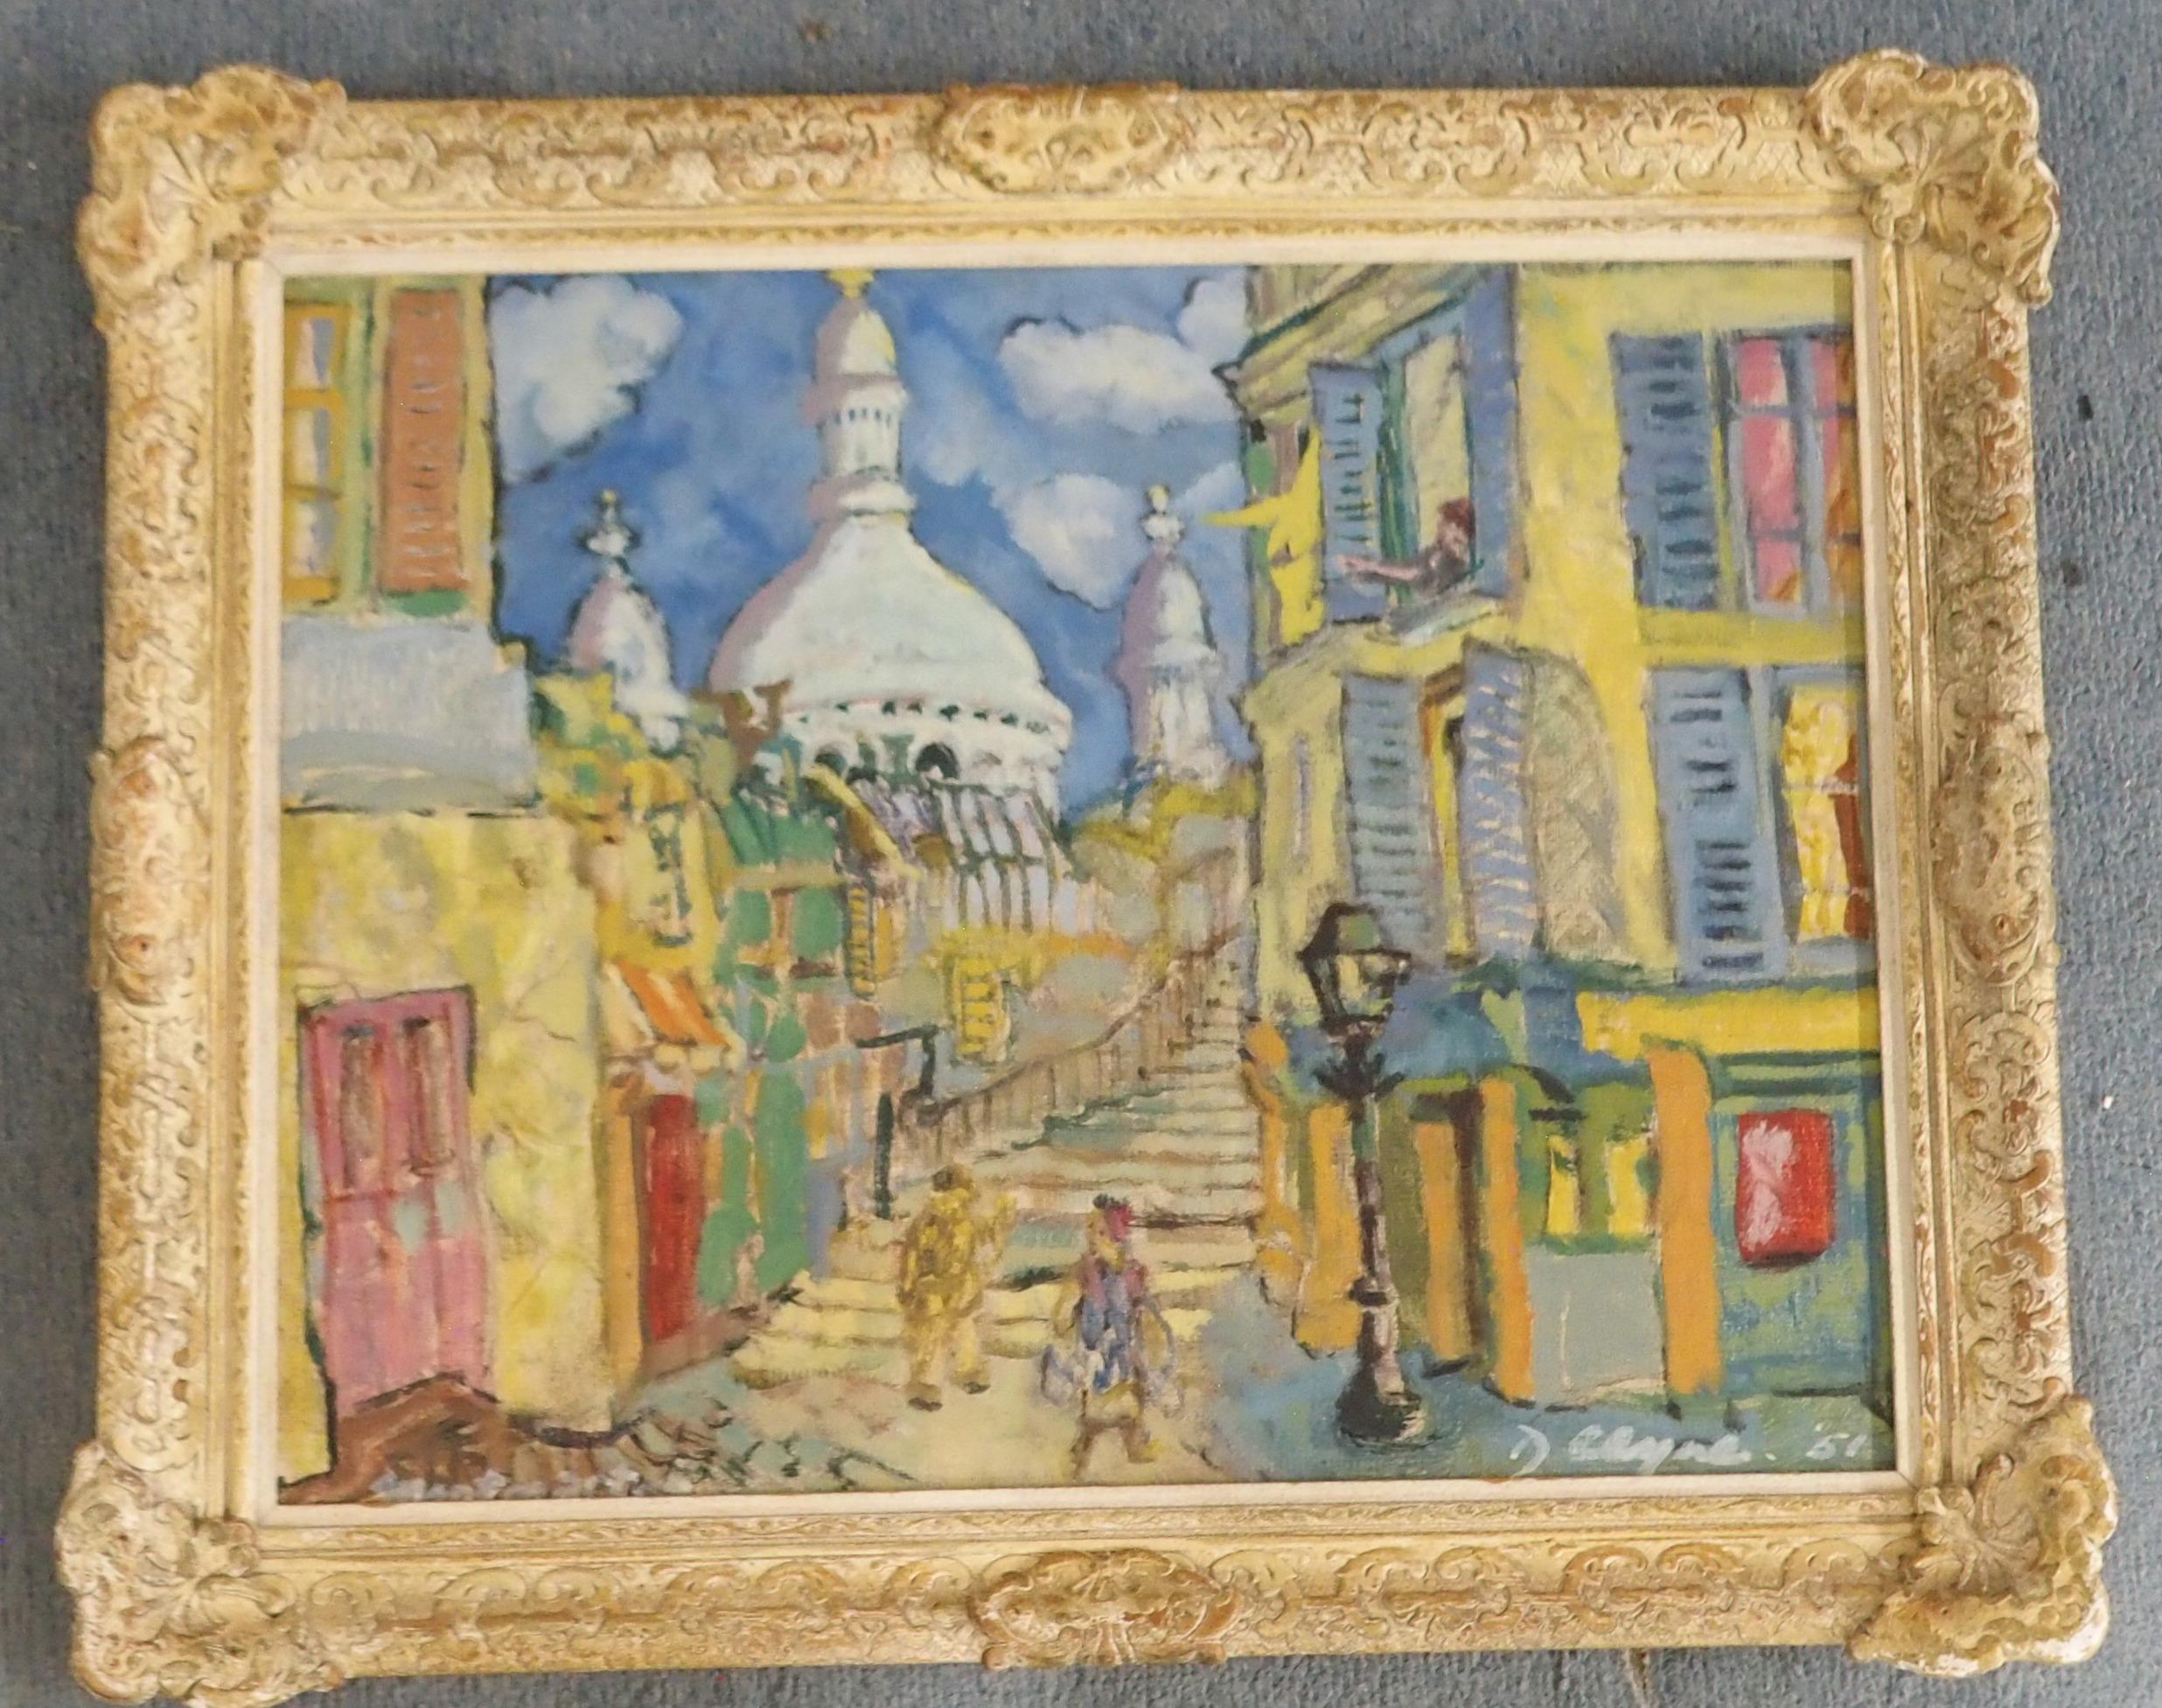 •WILLIAM DANIEL CLYNE (SCOTTISH 1922-1981) A CORNER IN OLD MONTMARTRE Oil on canvas board, signed - Image 2 of 4